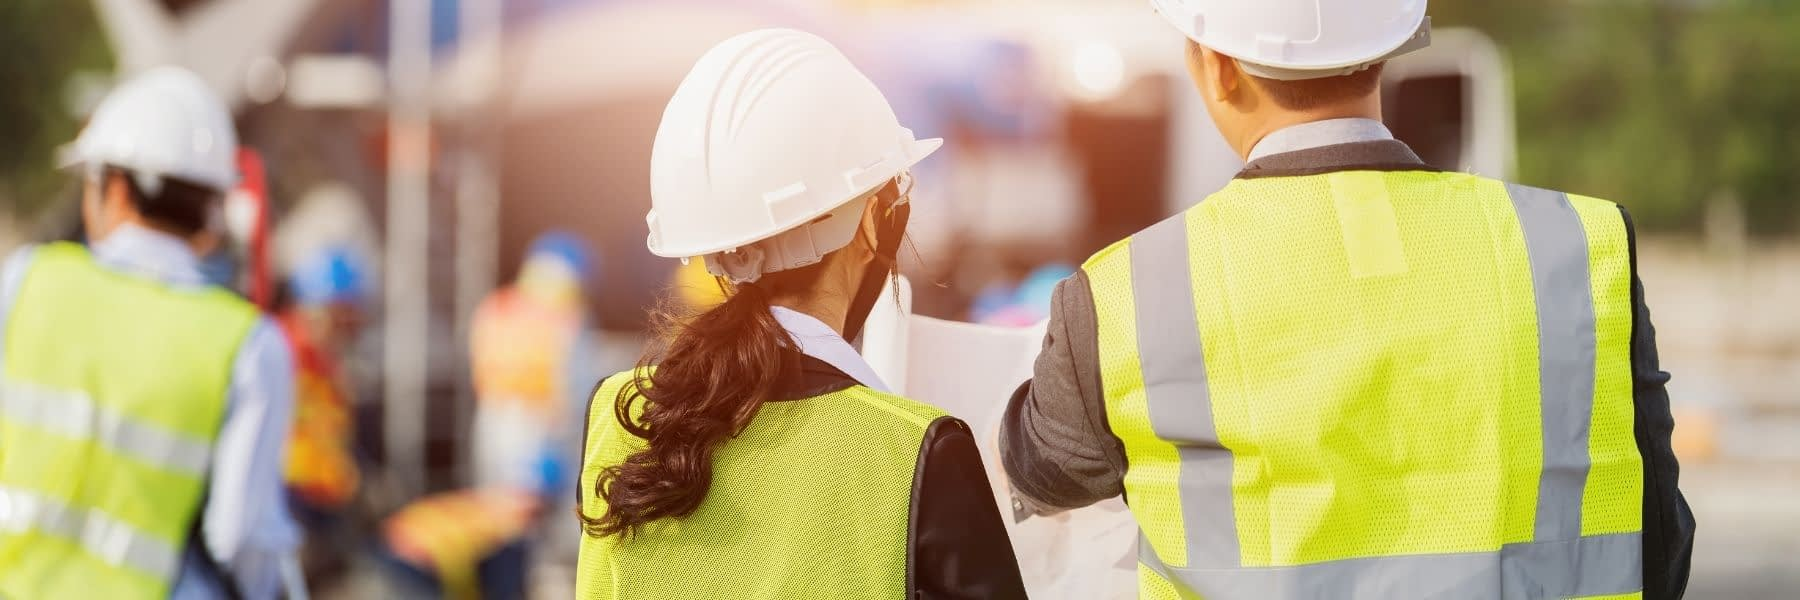 Essentials of Pre-Construction Services for Design-Build